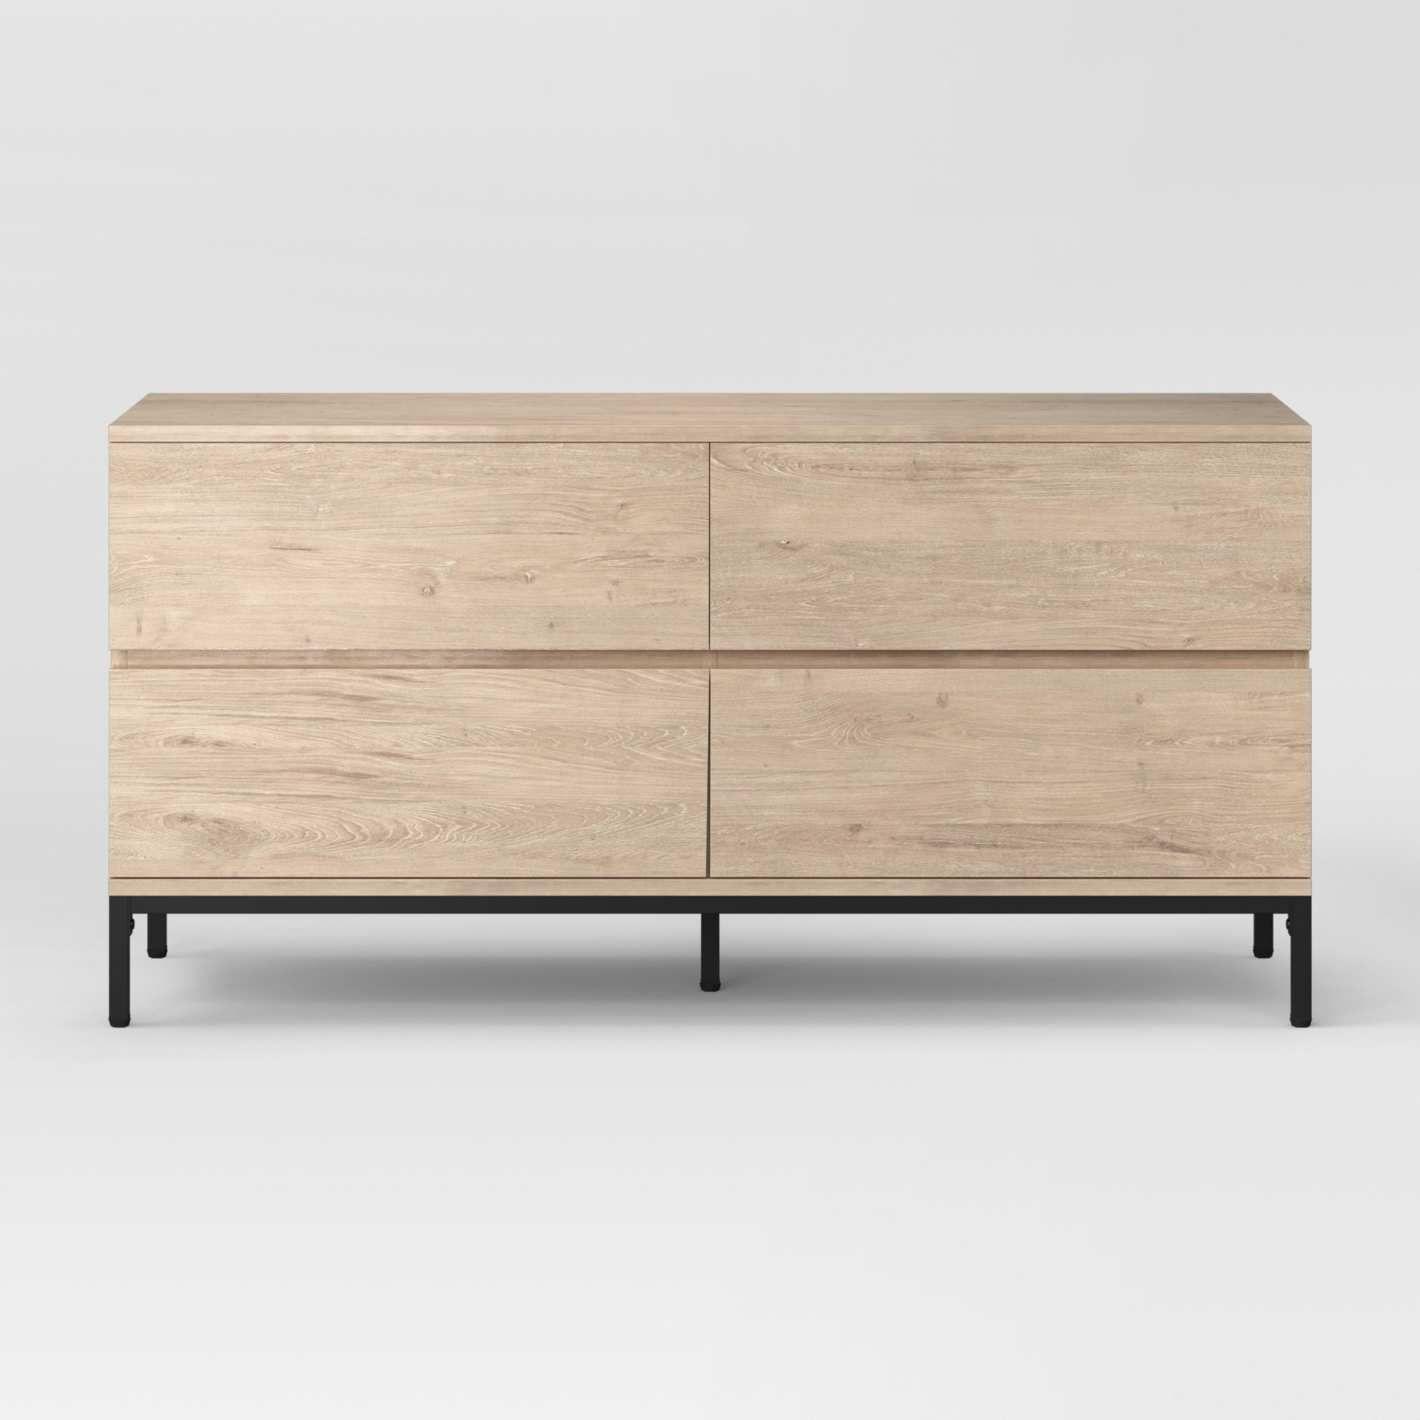 The Best Dressers Under 500 According To Interior Designers 4 Drawer Dresser Dresser Drawers Best Home Interior Design [ 1420 x 1420 Pixel ]